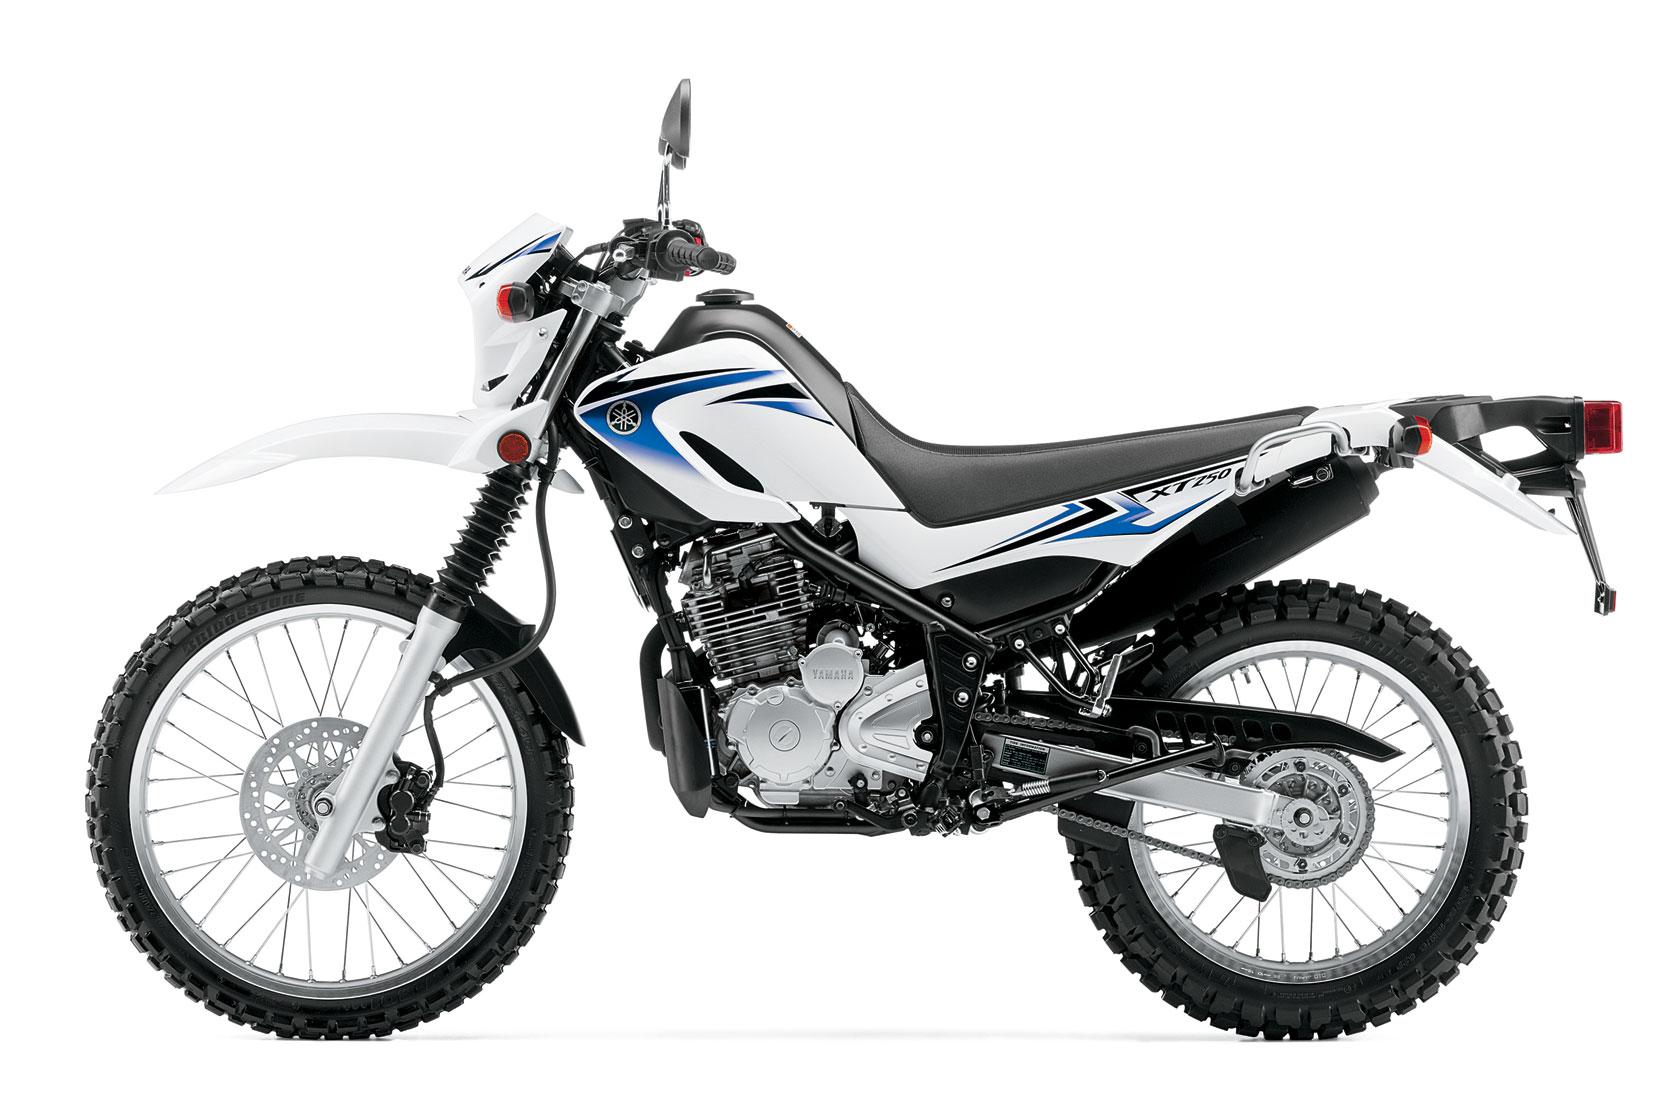 расход топлива мотоциклы 600 кубов #10